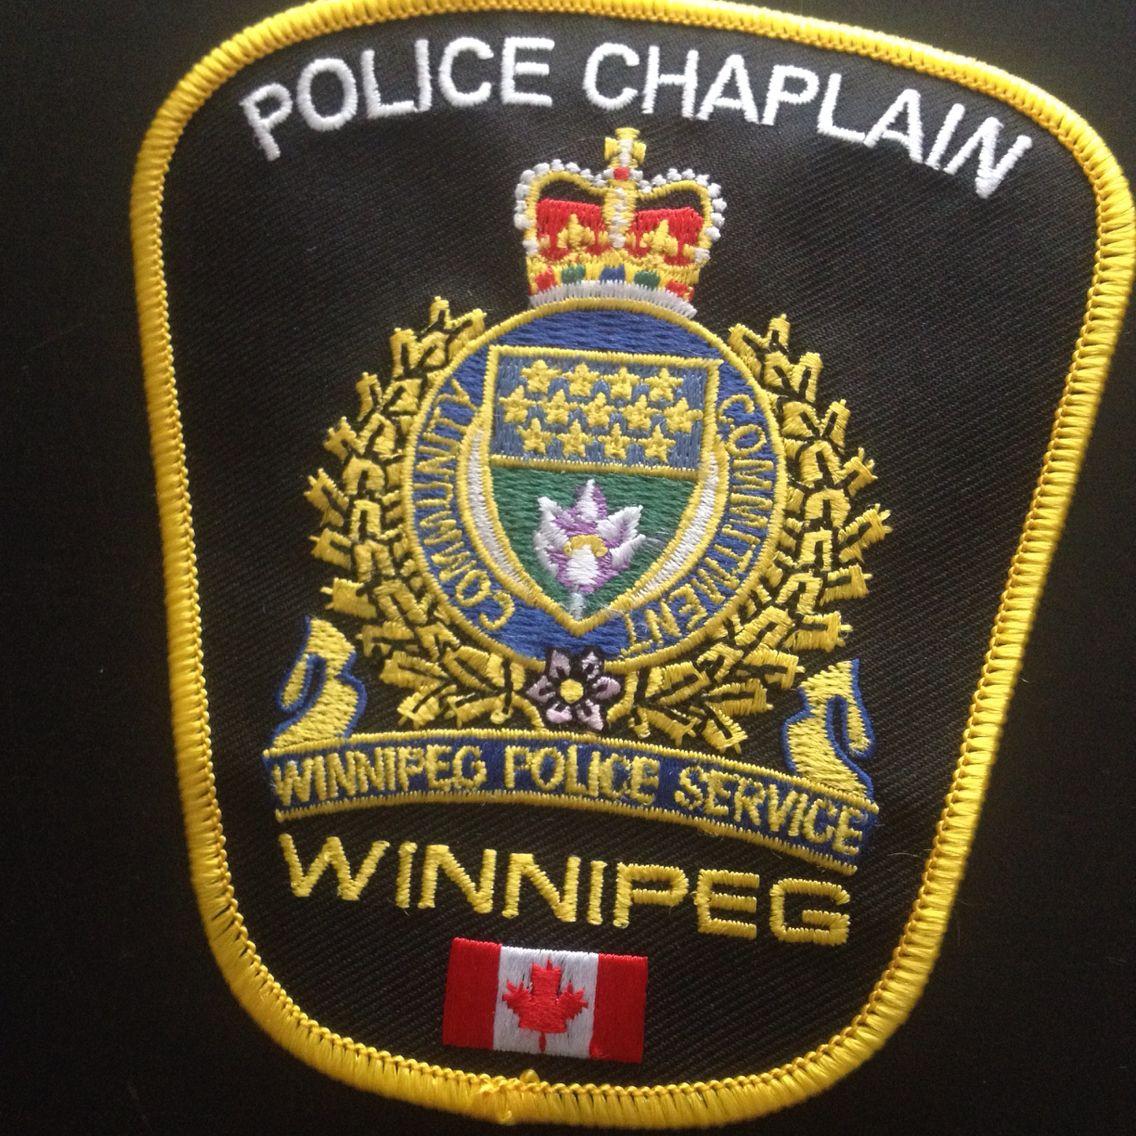 winnipeg police chaplain badges police chaplain